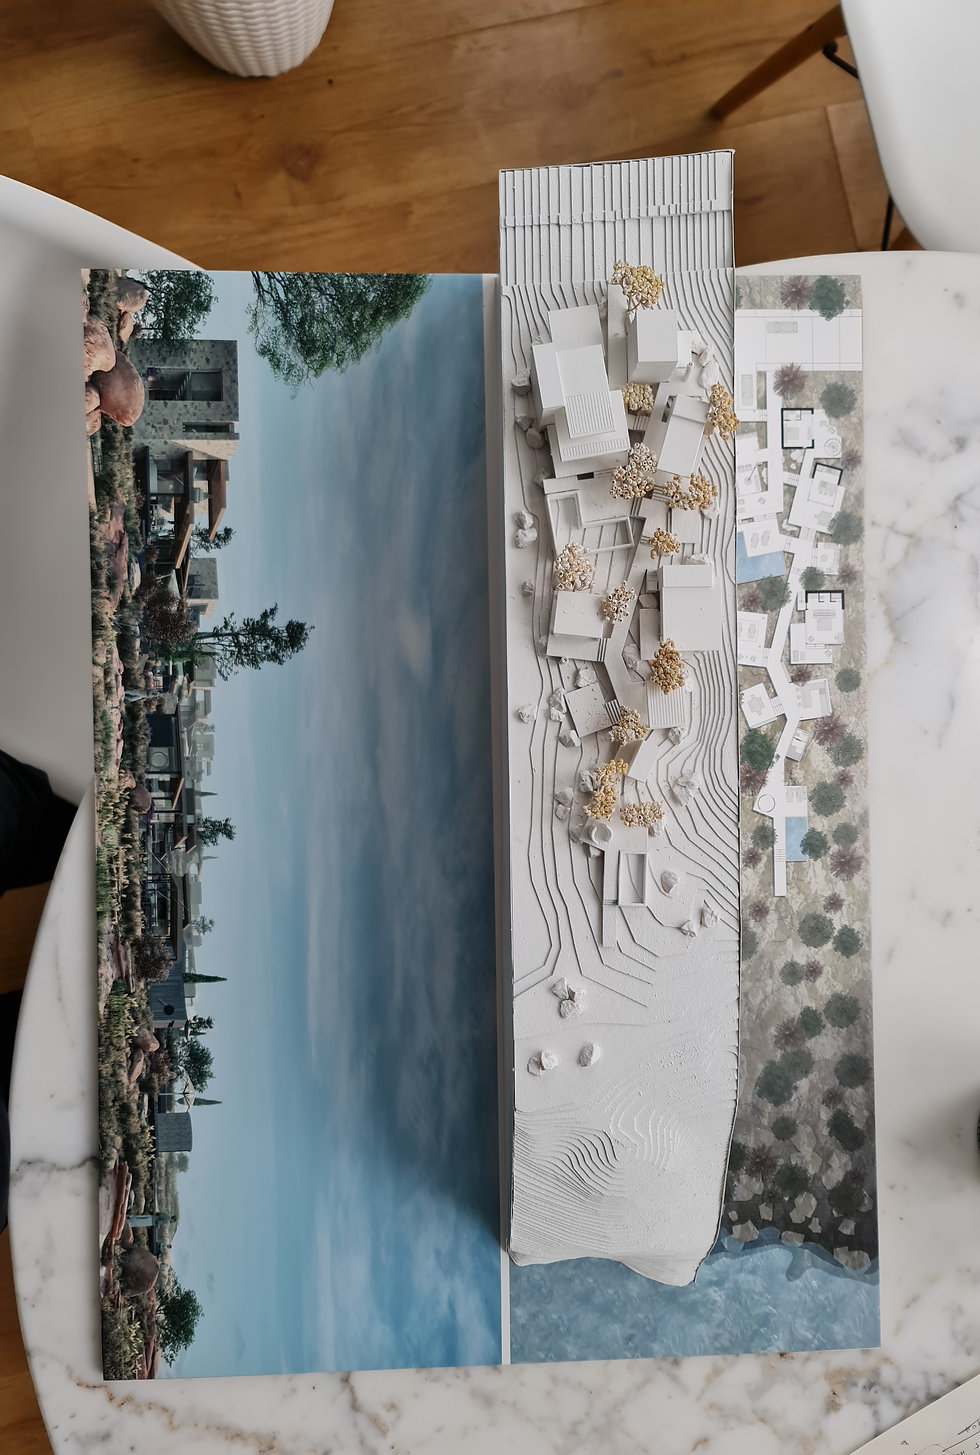 KIZILBURUN HOTEL + RESIDENCES